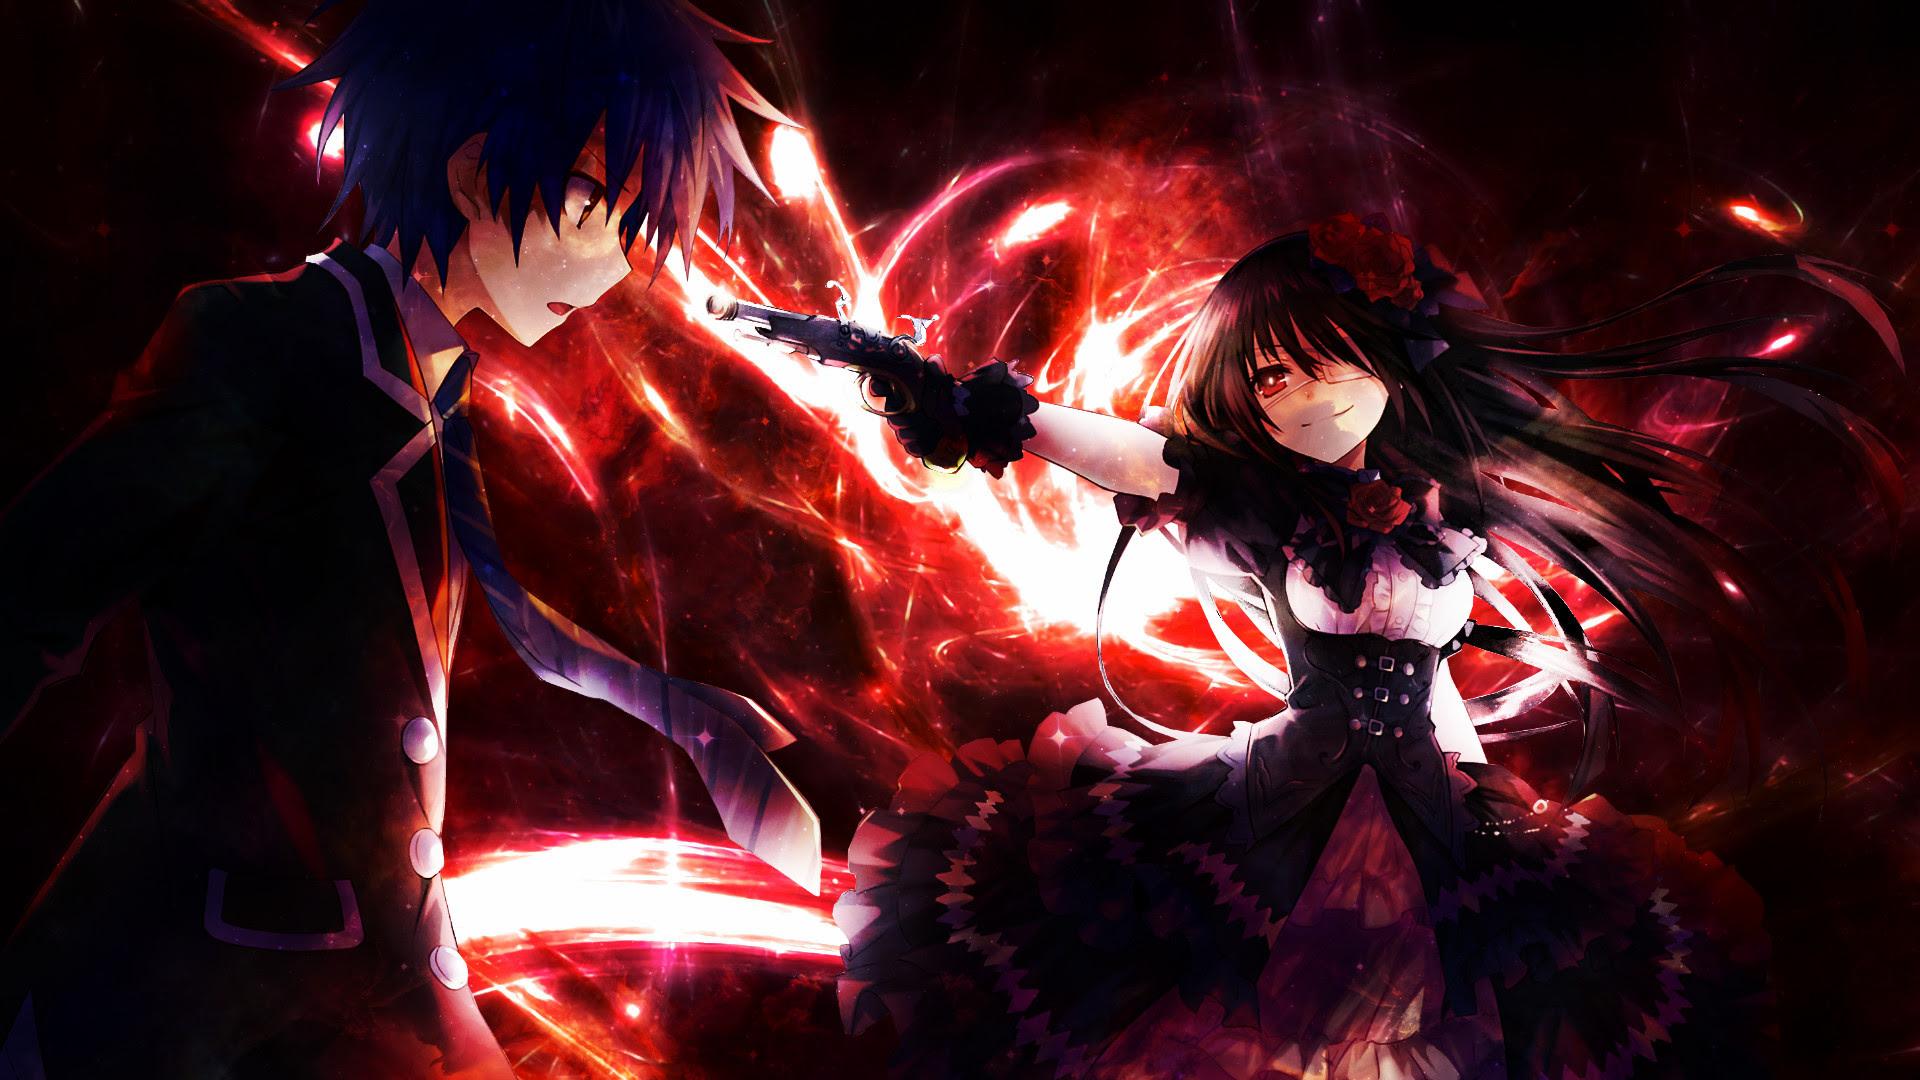 29 Wallpaper 4k Live Anime Anime Top Wallpaper